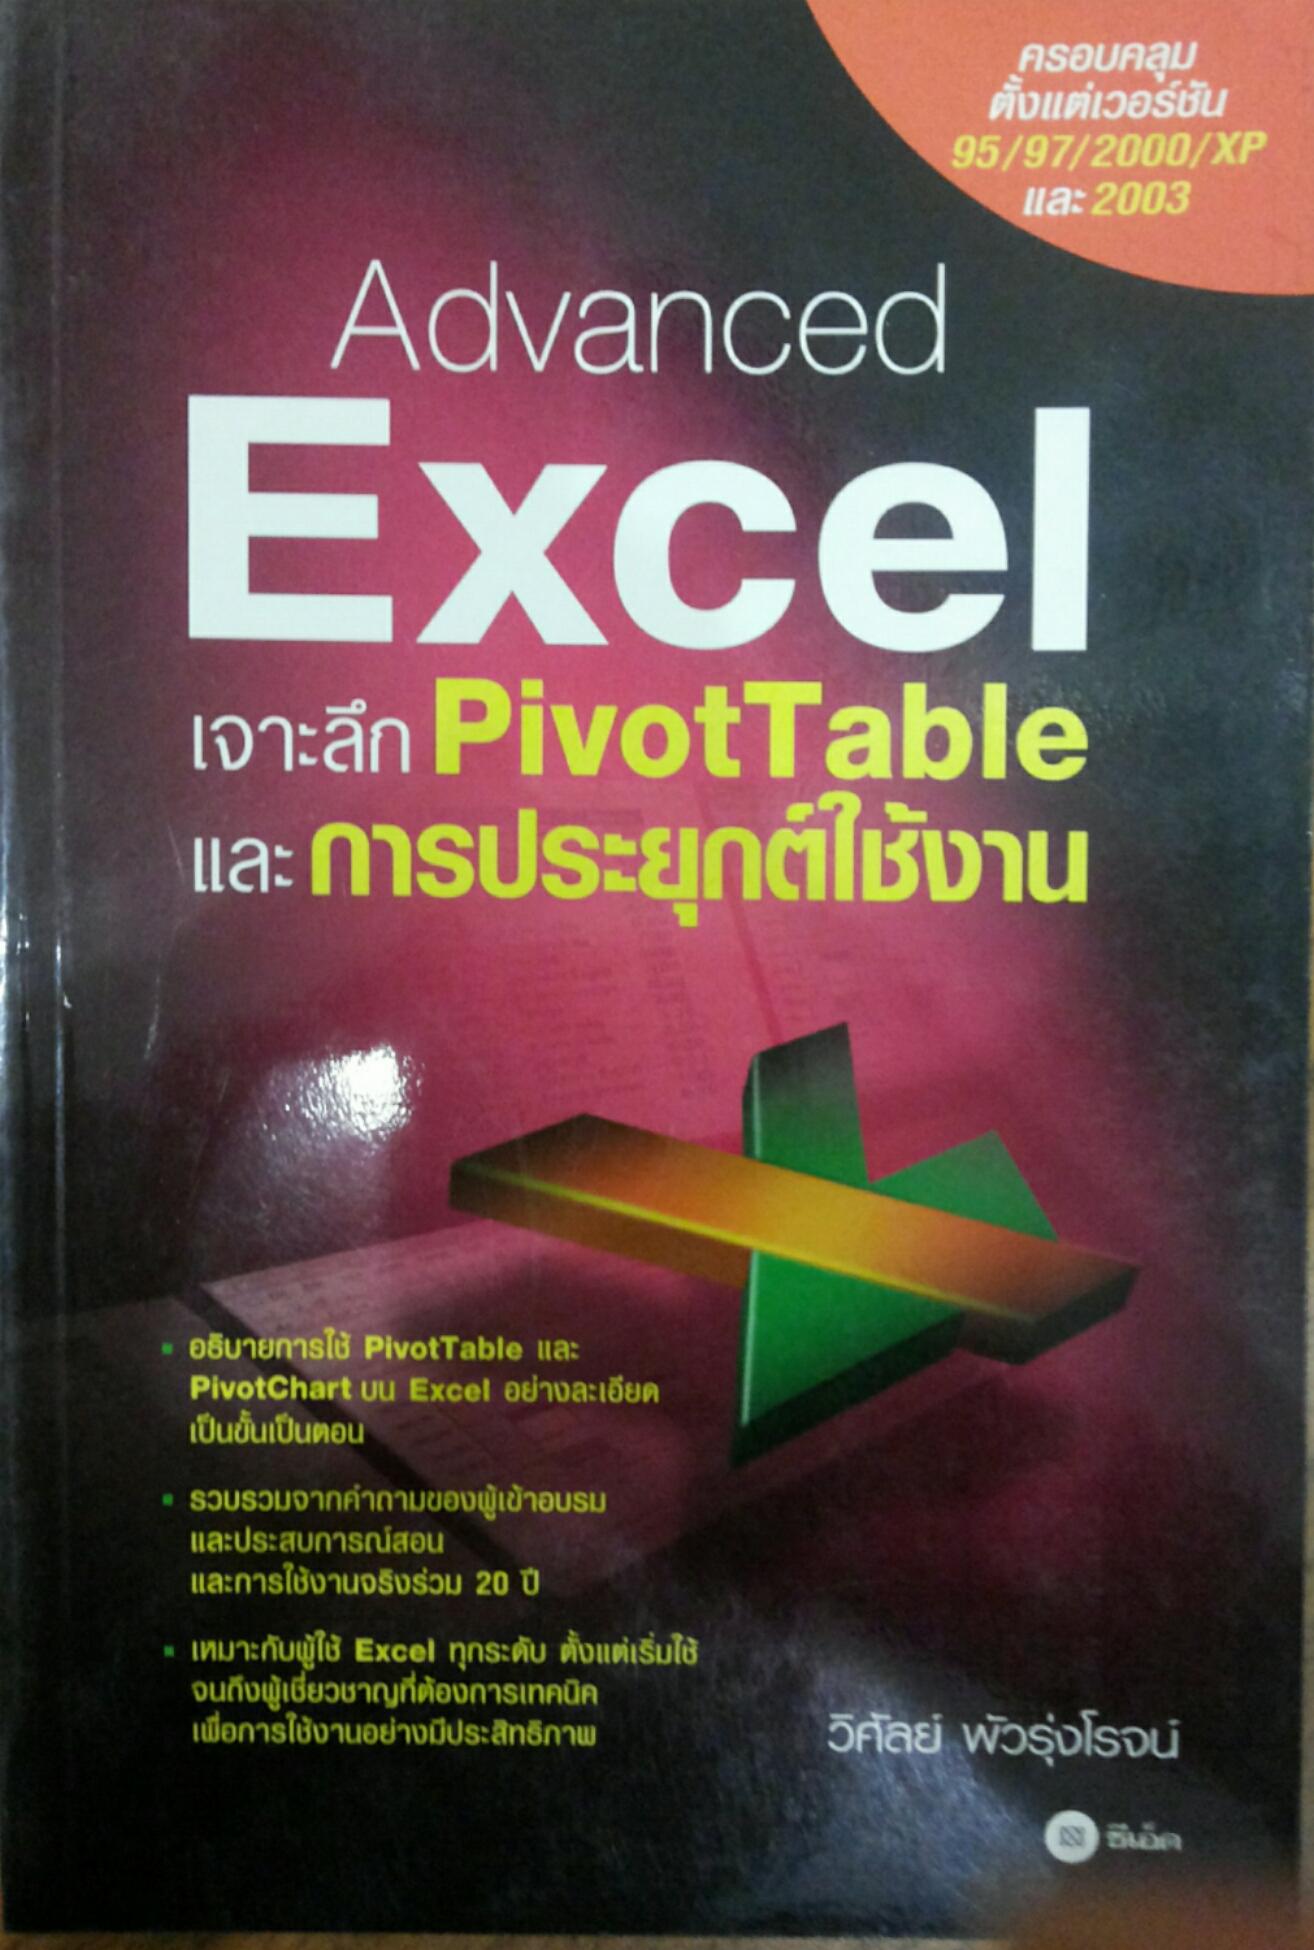 Advanced Excel เจาะลึก PivotTable และ การประยุกต์ใช้งาน